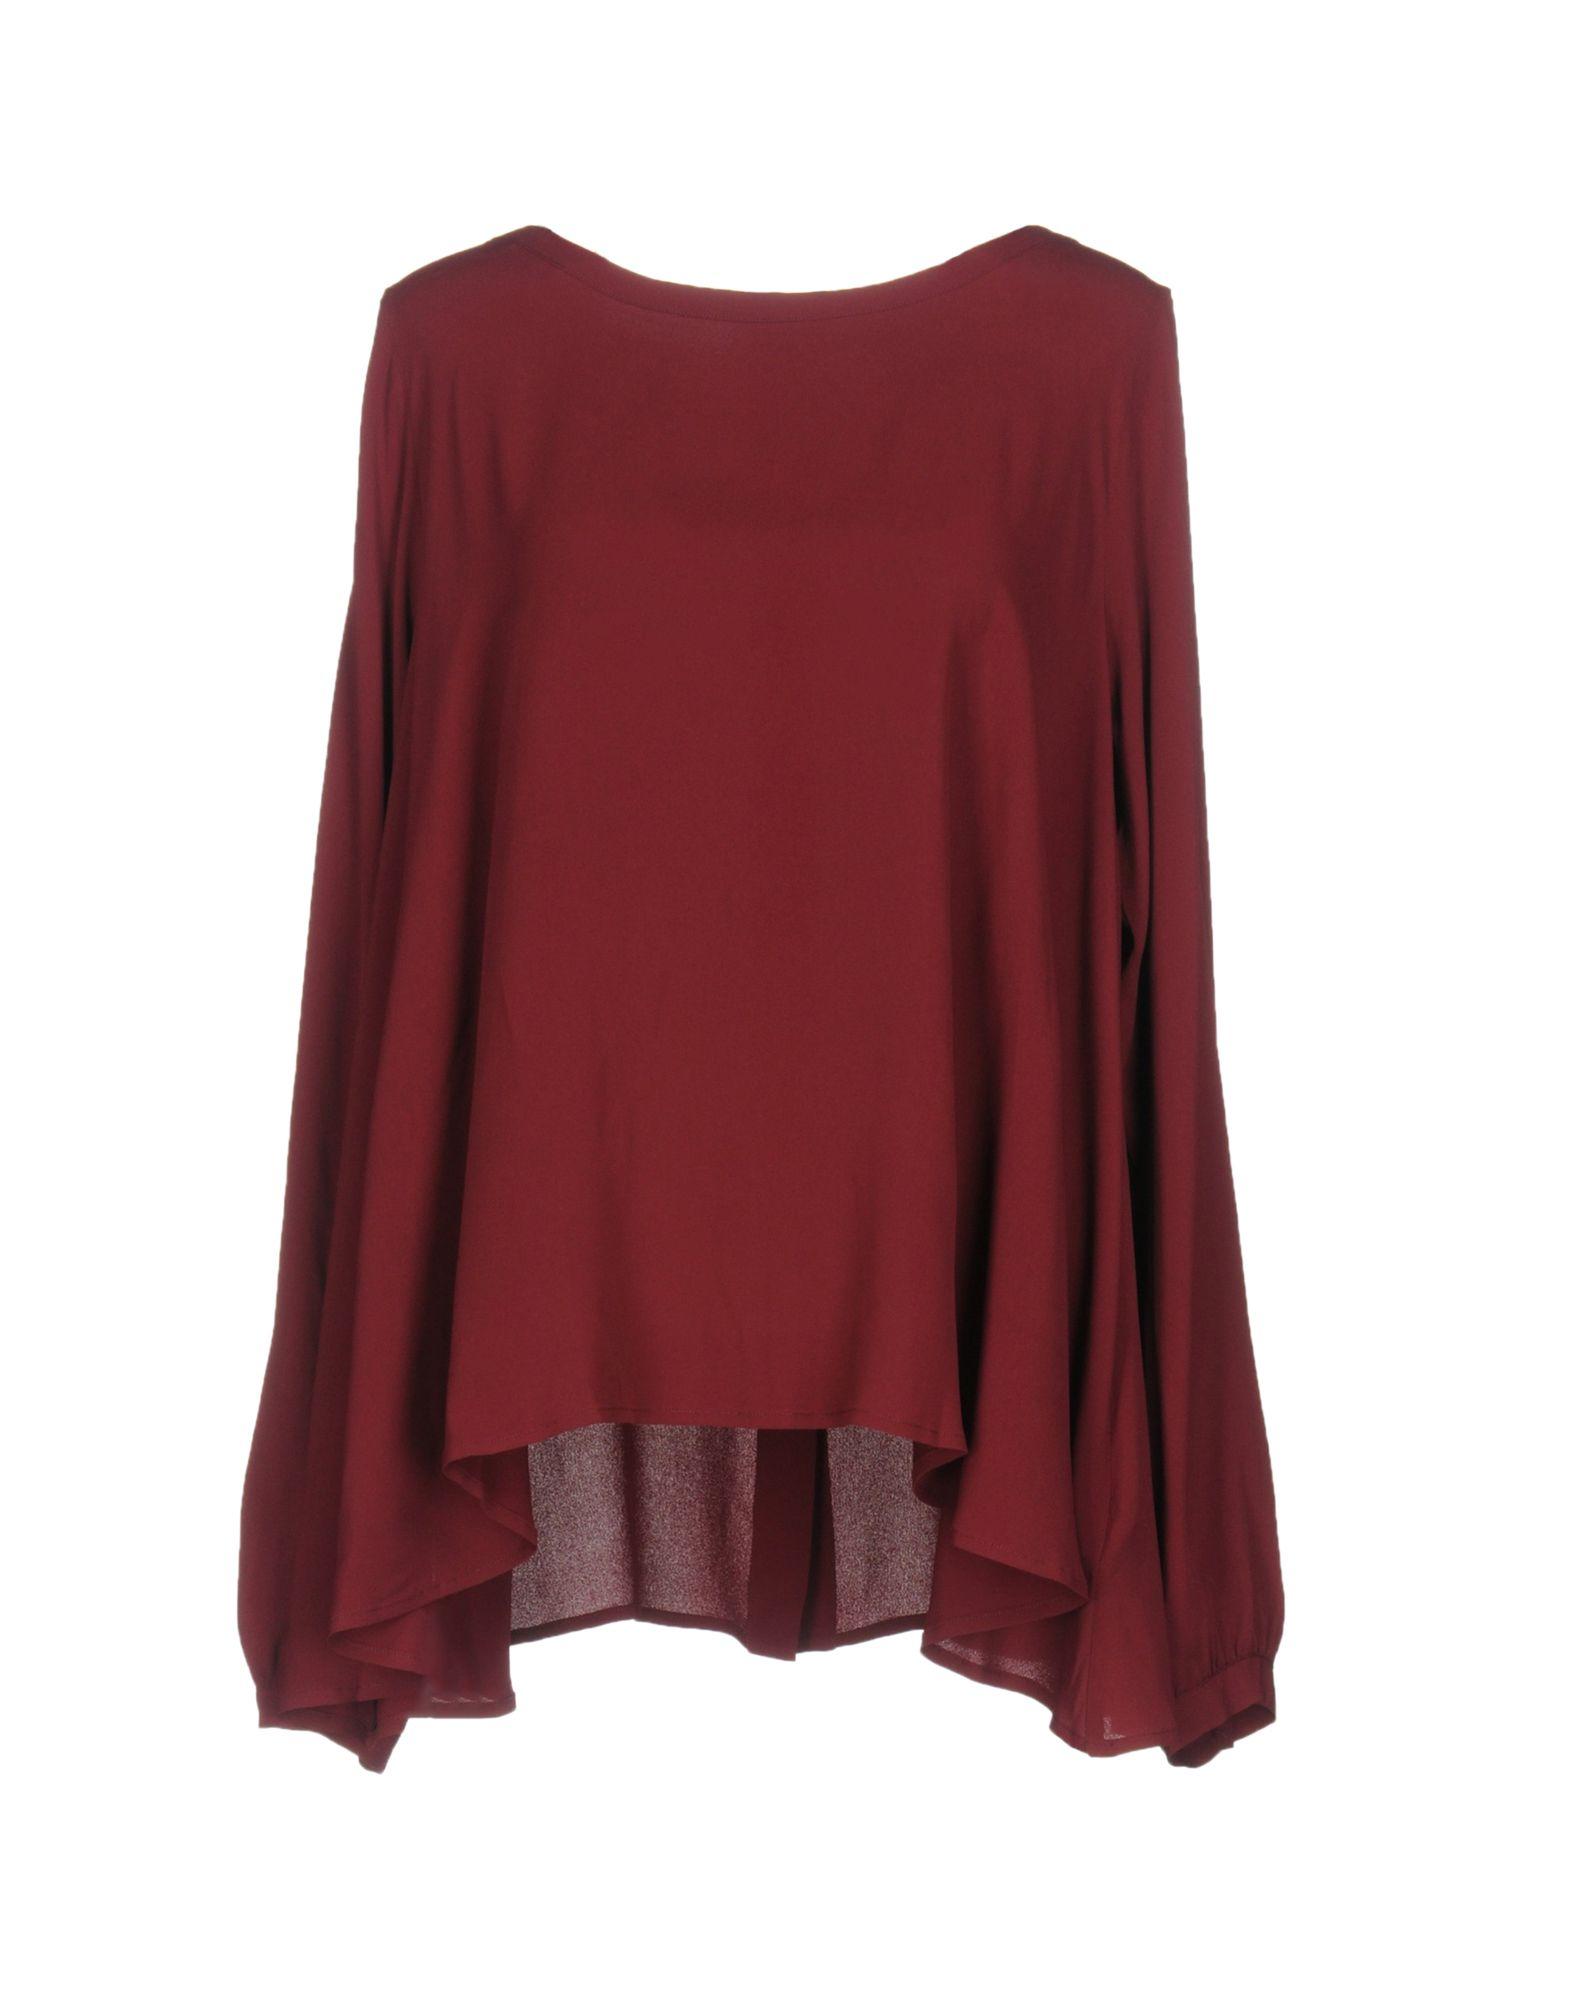 MAURO GRIFONI Damen Bluse Farbe Bordeaux Größe 4